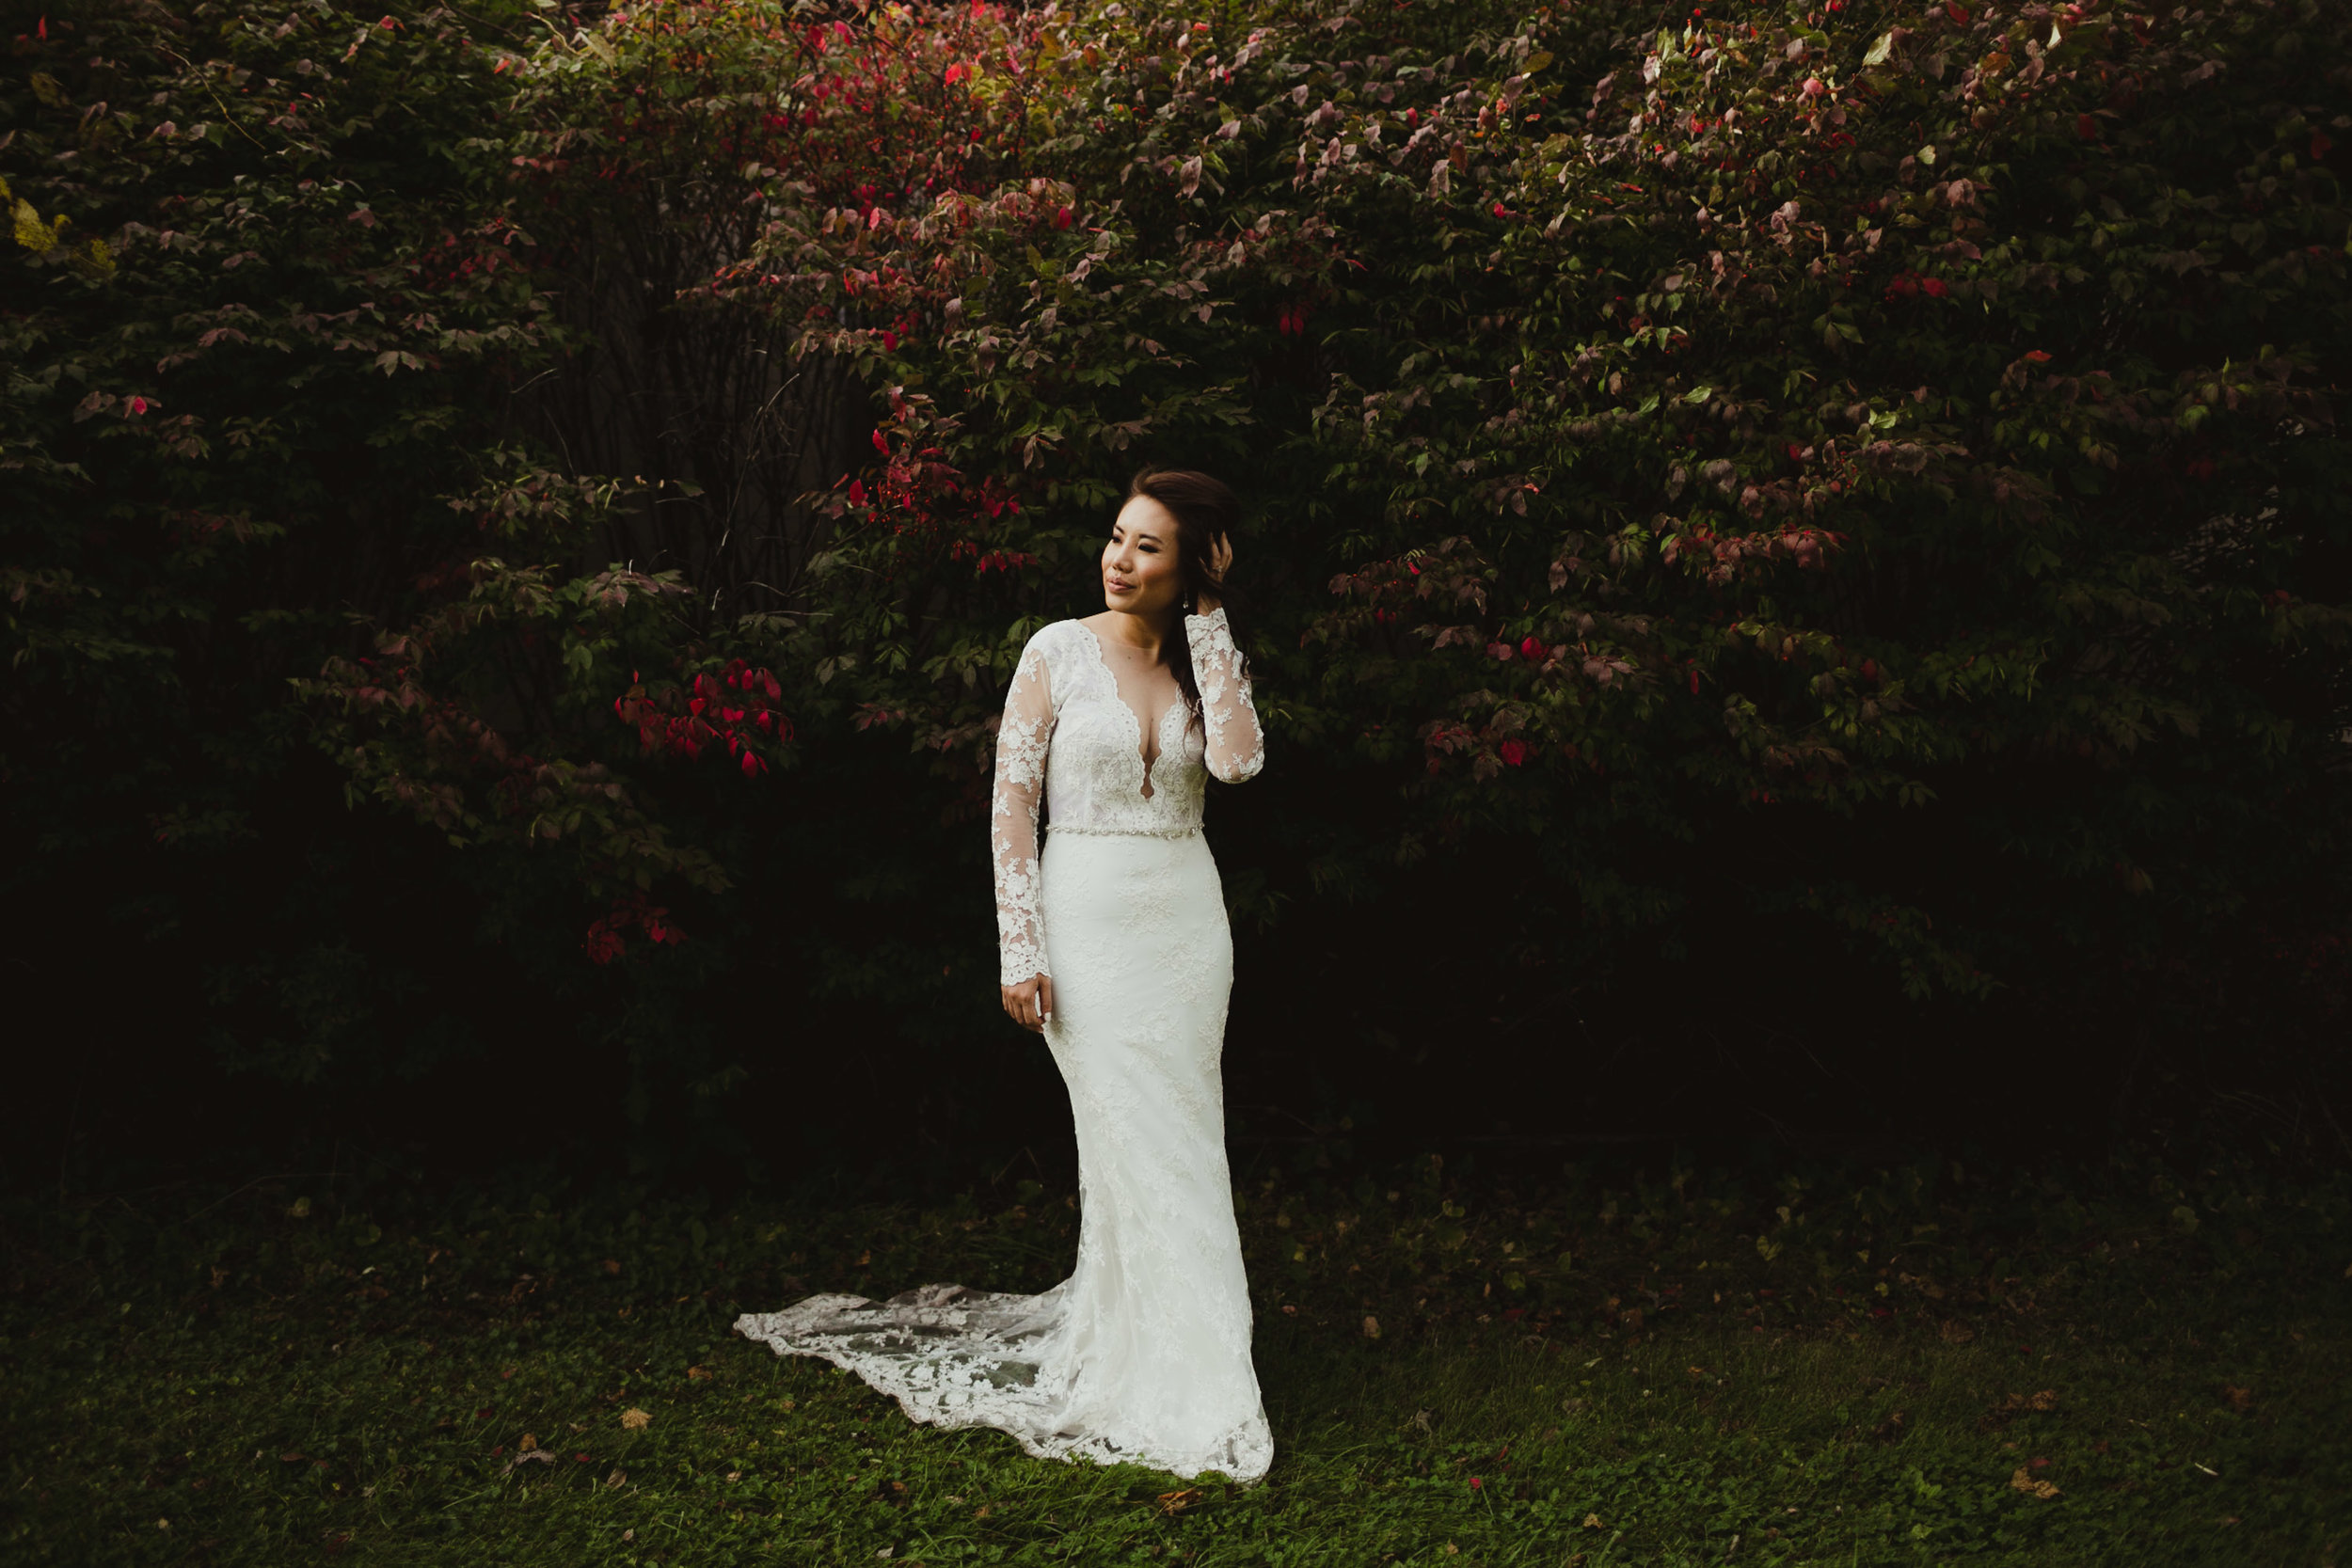 kansas-city-wedding-photographer_050.jpg